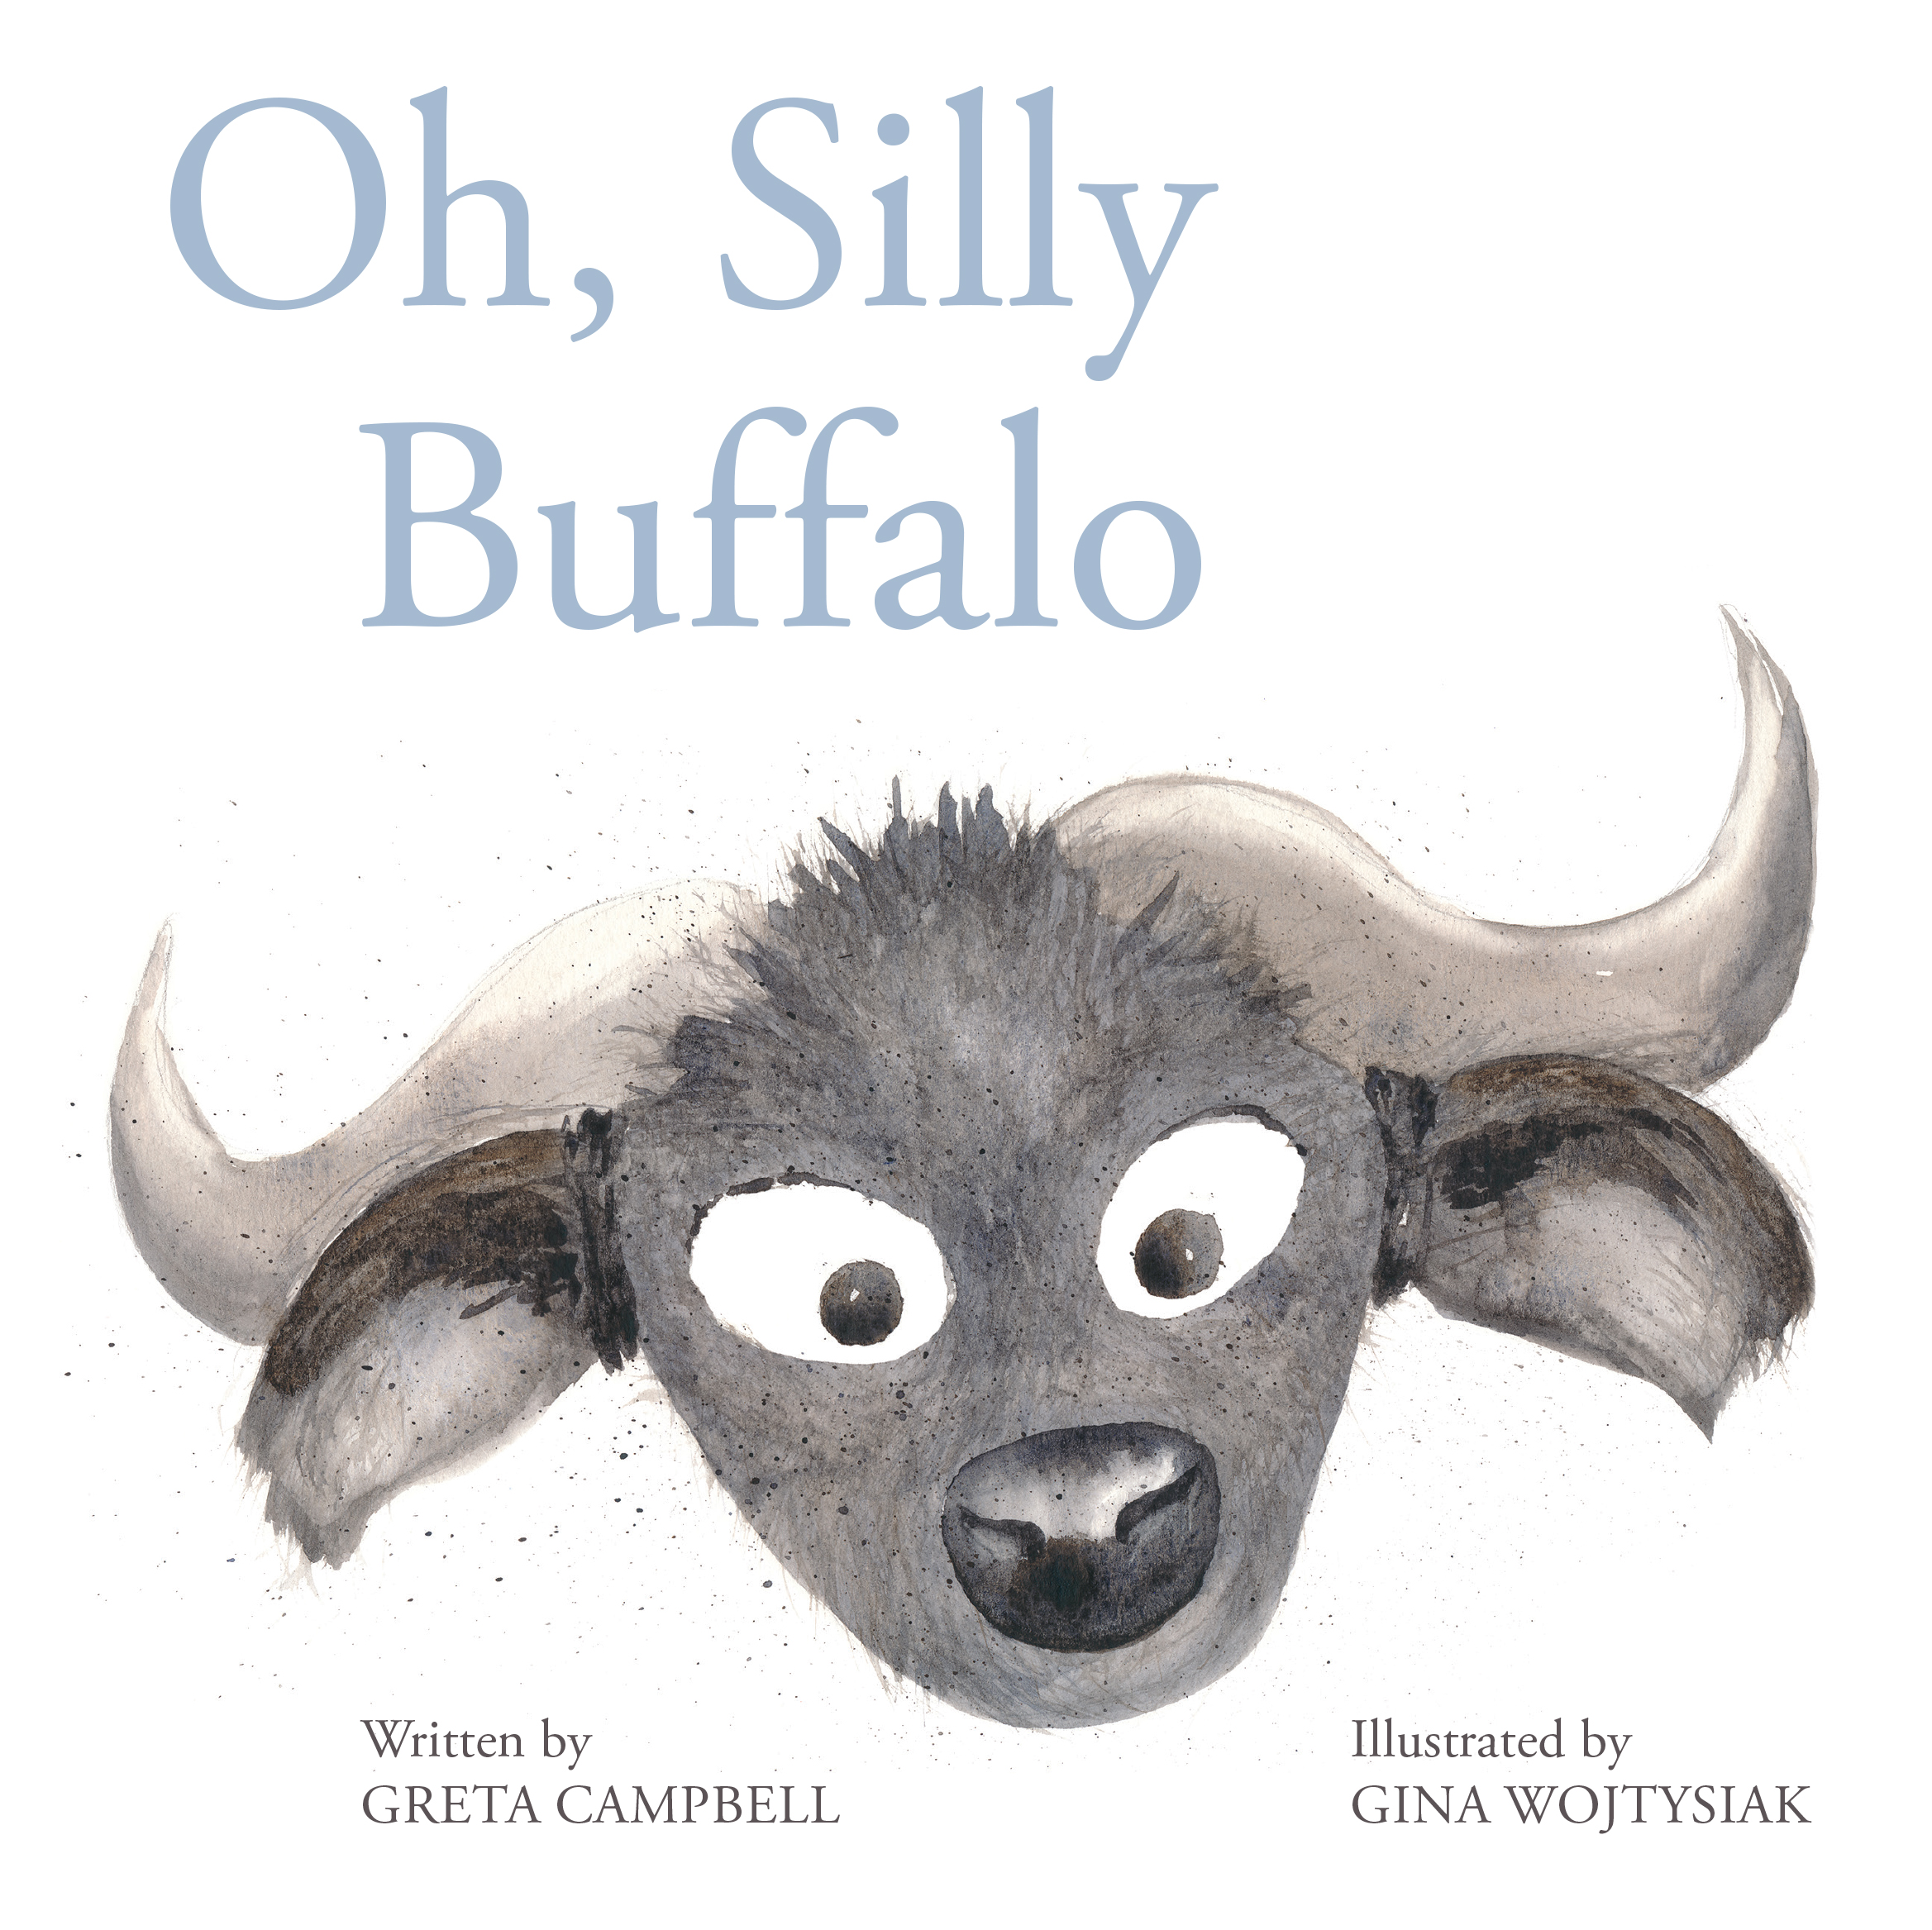 Oh, Silly Buffalo / Greta Campbell & Gina Wojtysiak